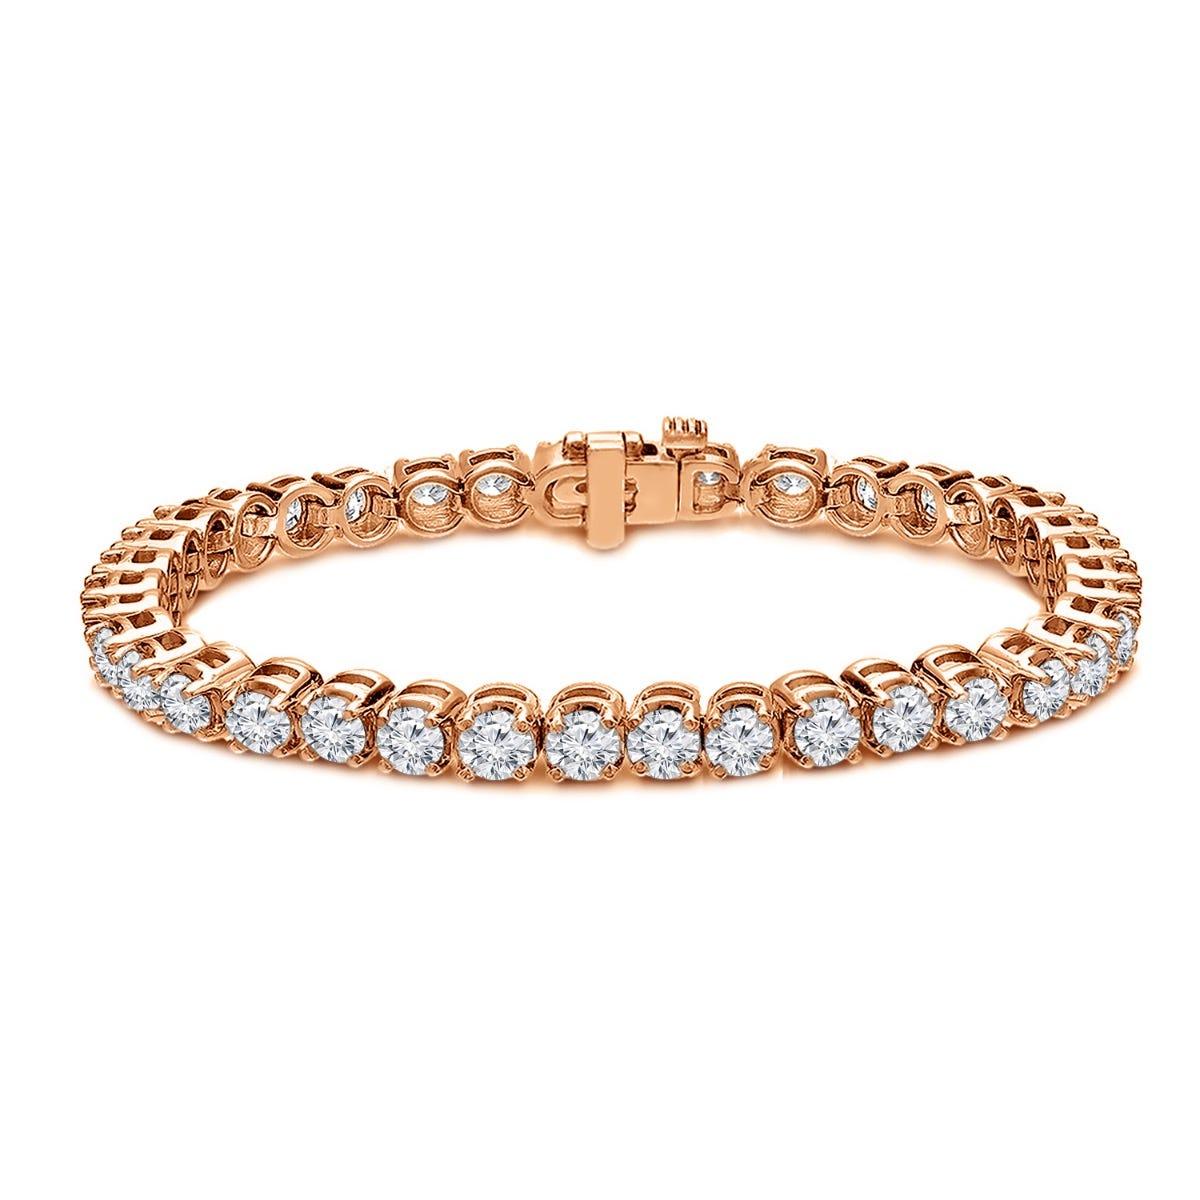 8ctw. 4-Prong Round Link Diamond Tennis Bracelet in 14K Rose Gold (JK, I2-I3, 42-Stone)